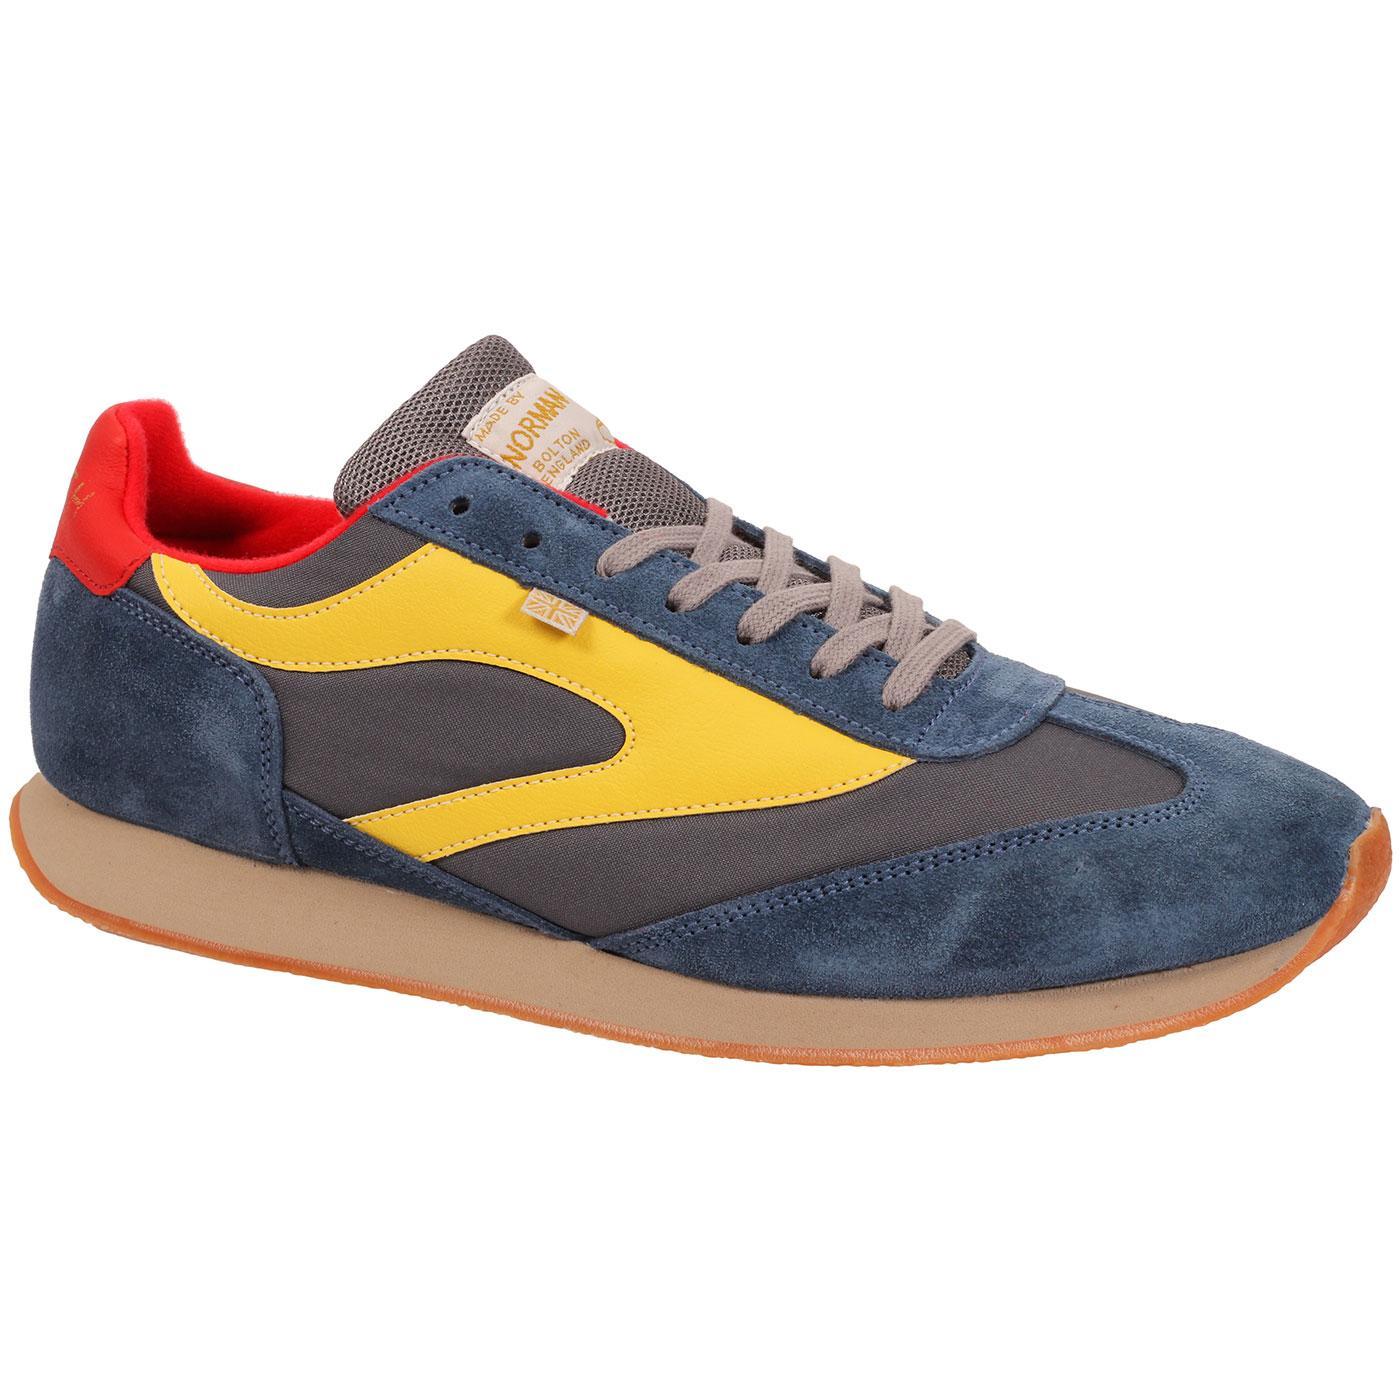 Fierce + WALSH Made in England Retro Trainers B/Y